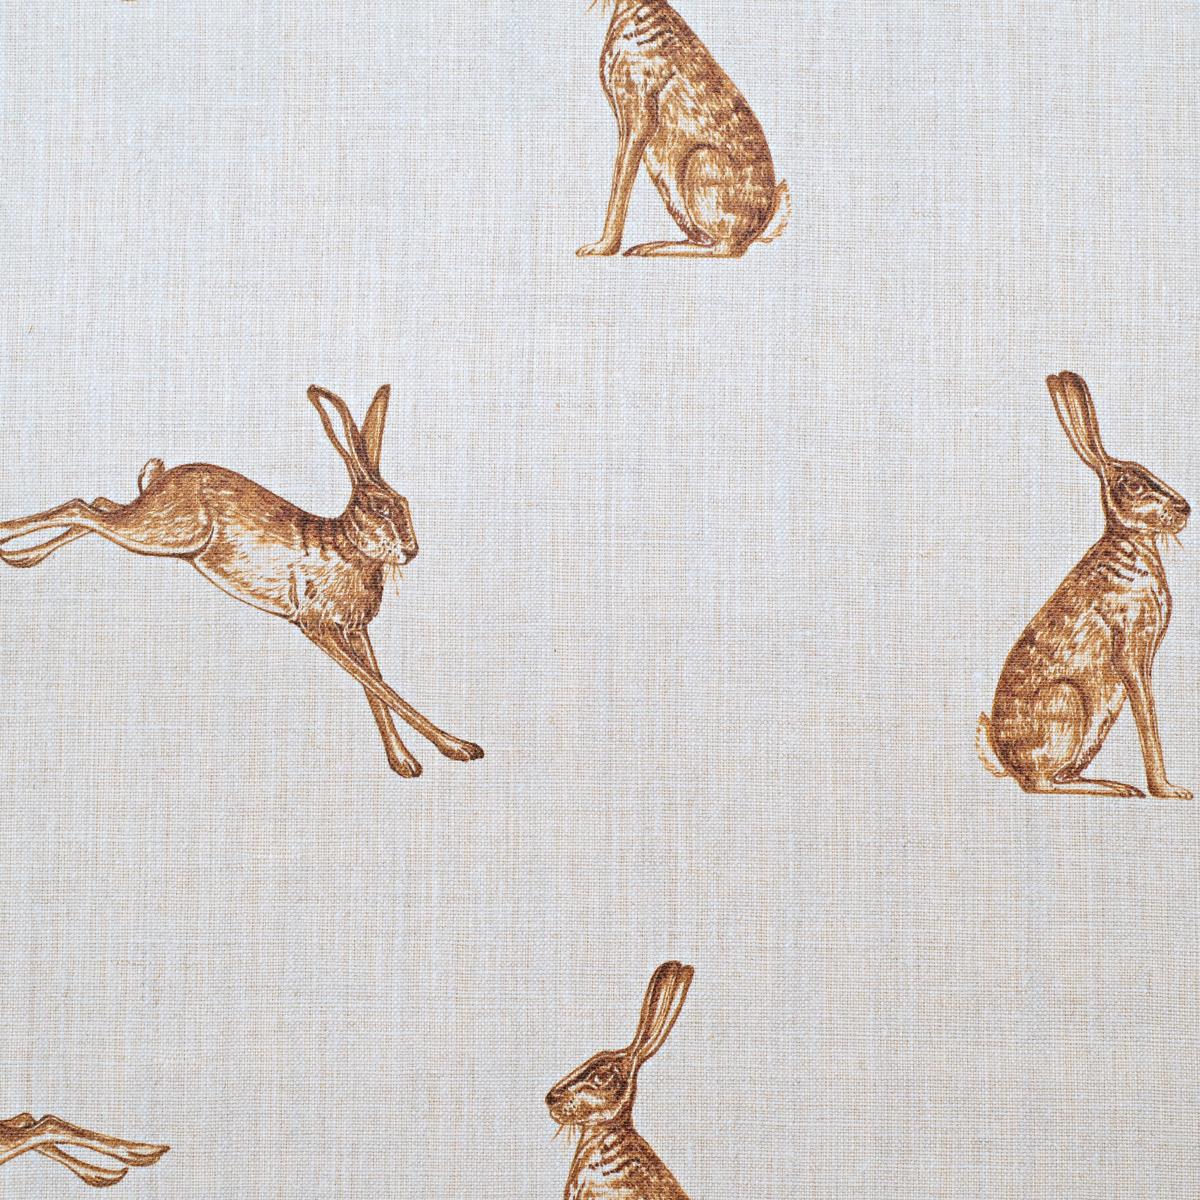 French Hares Fudge On Cream Linen